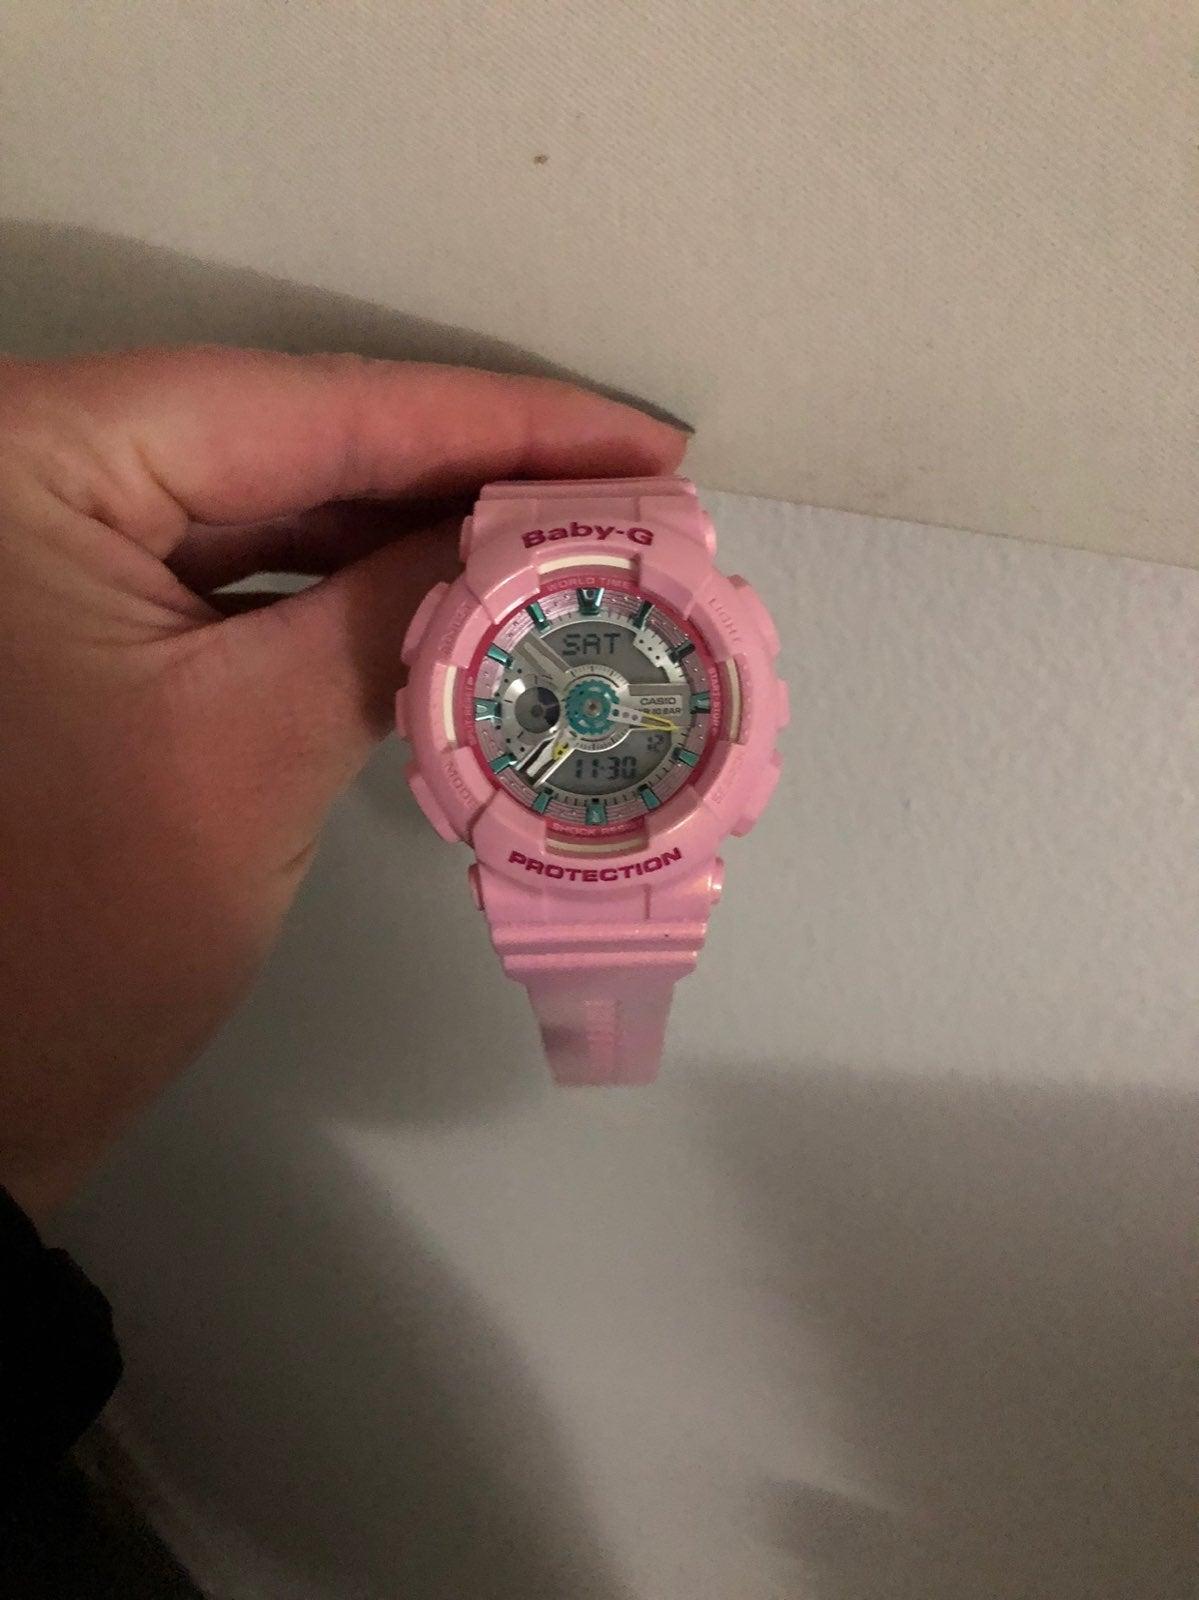 Baby G Shock Watch pink